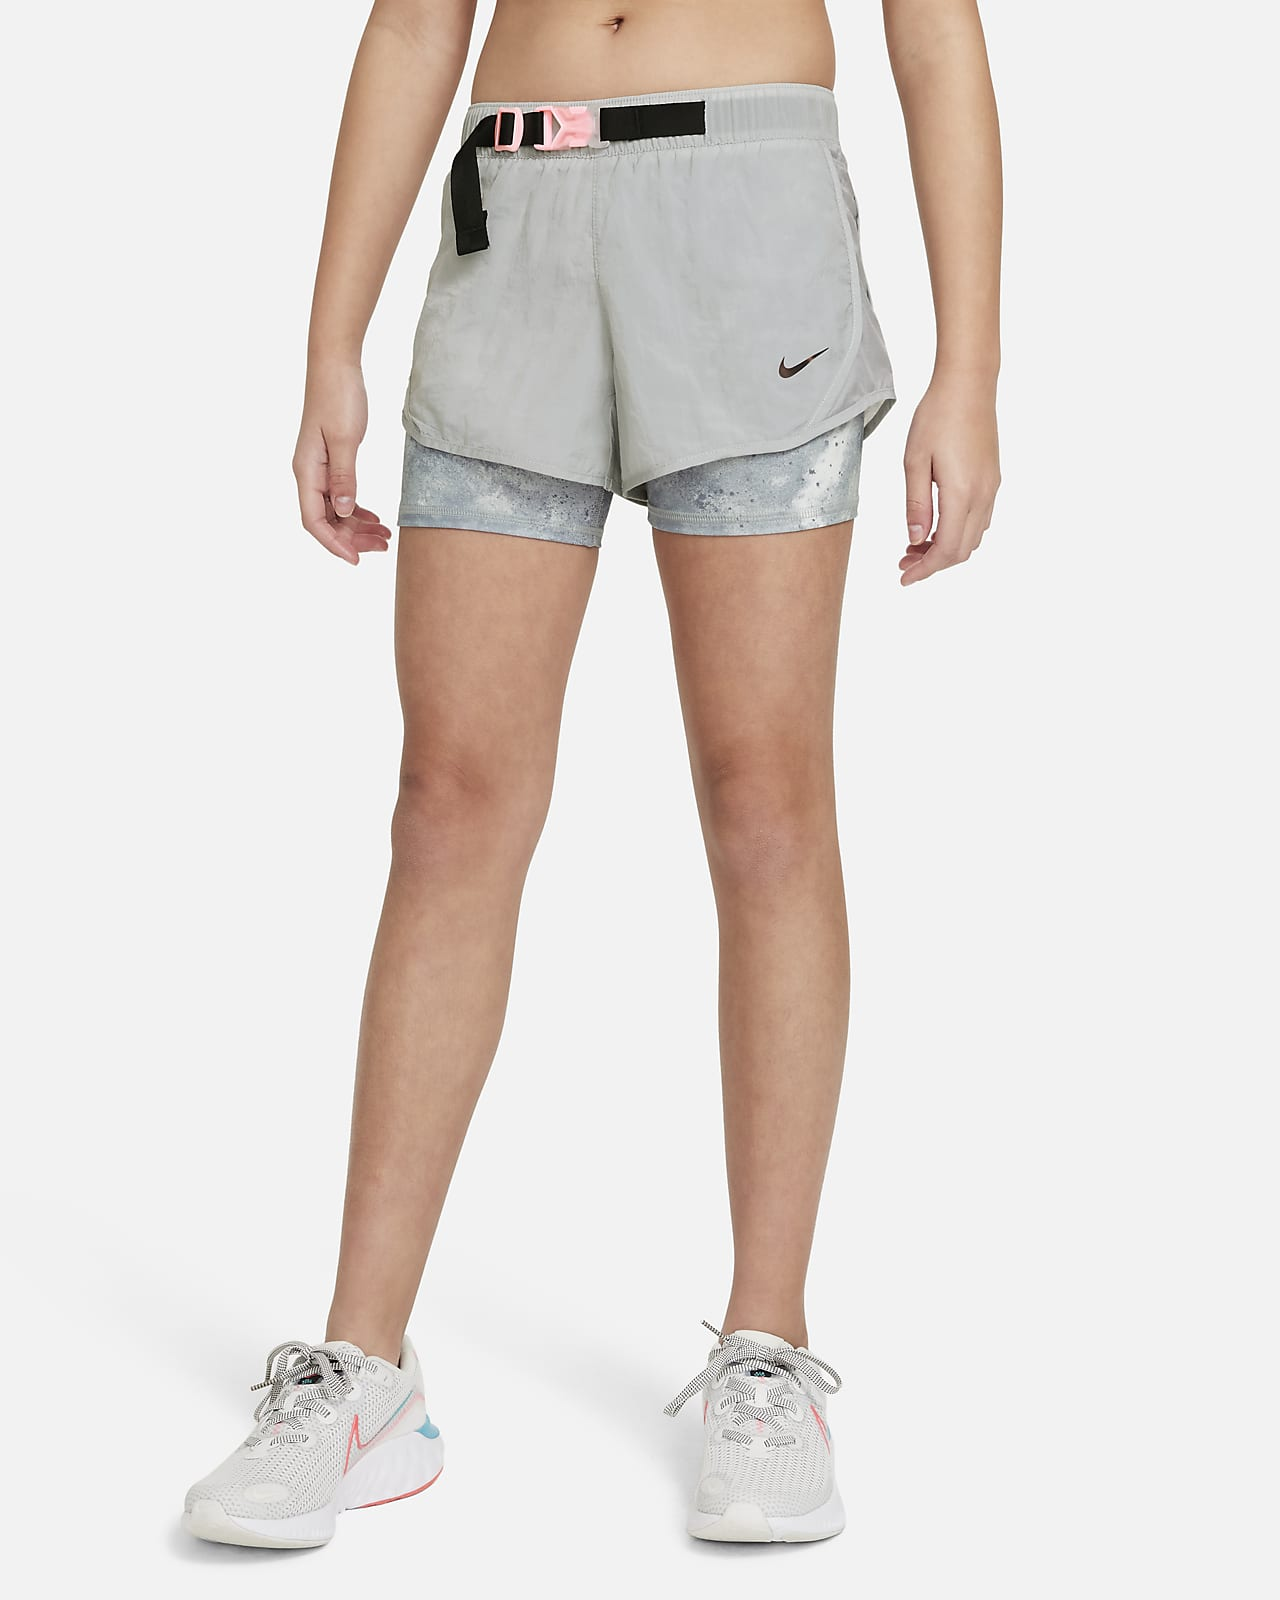 Nike Tempo Older Kids' (Girls') Tie-Dye Running Shorts